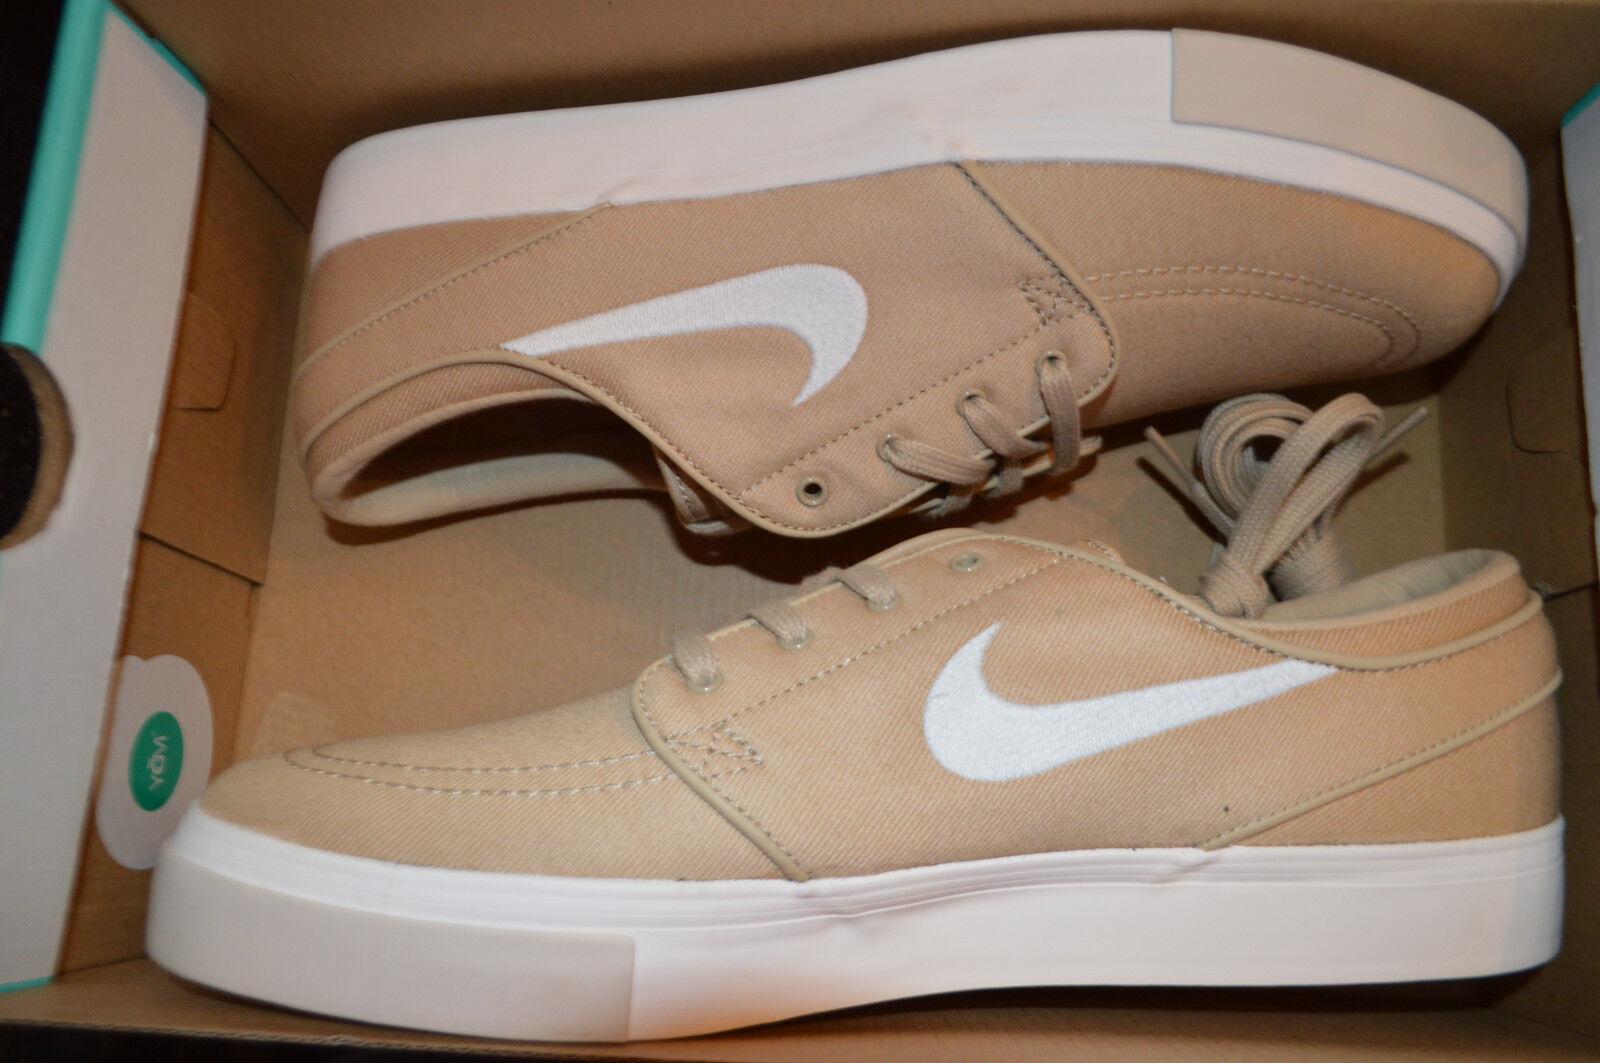 Nueva Nike hombre SB zoom Janoski CNVs 855628-211 lienzo CPSL zapatos zapatillas 855628-211 CNVs reducción de precio bdcb10